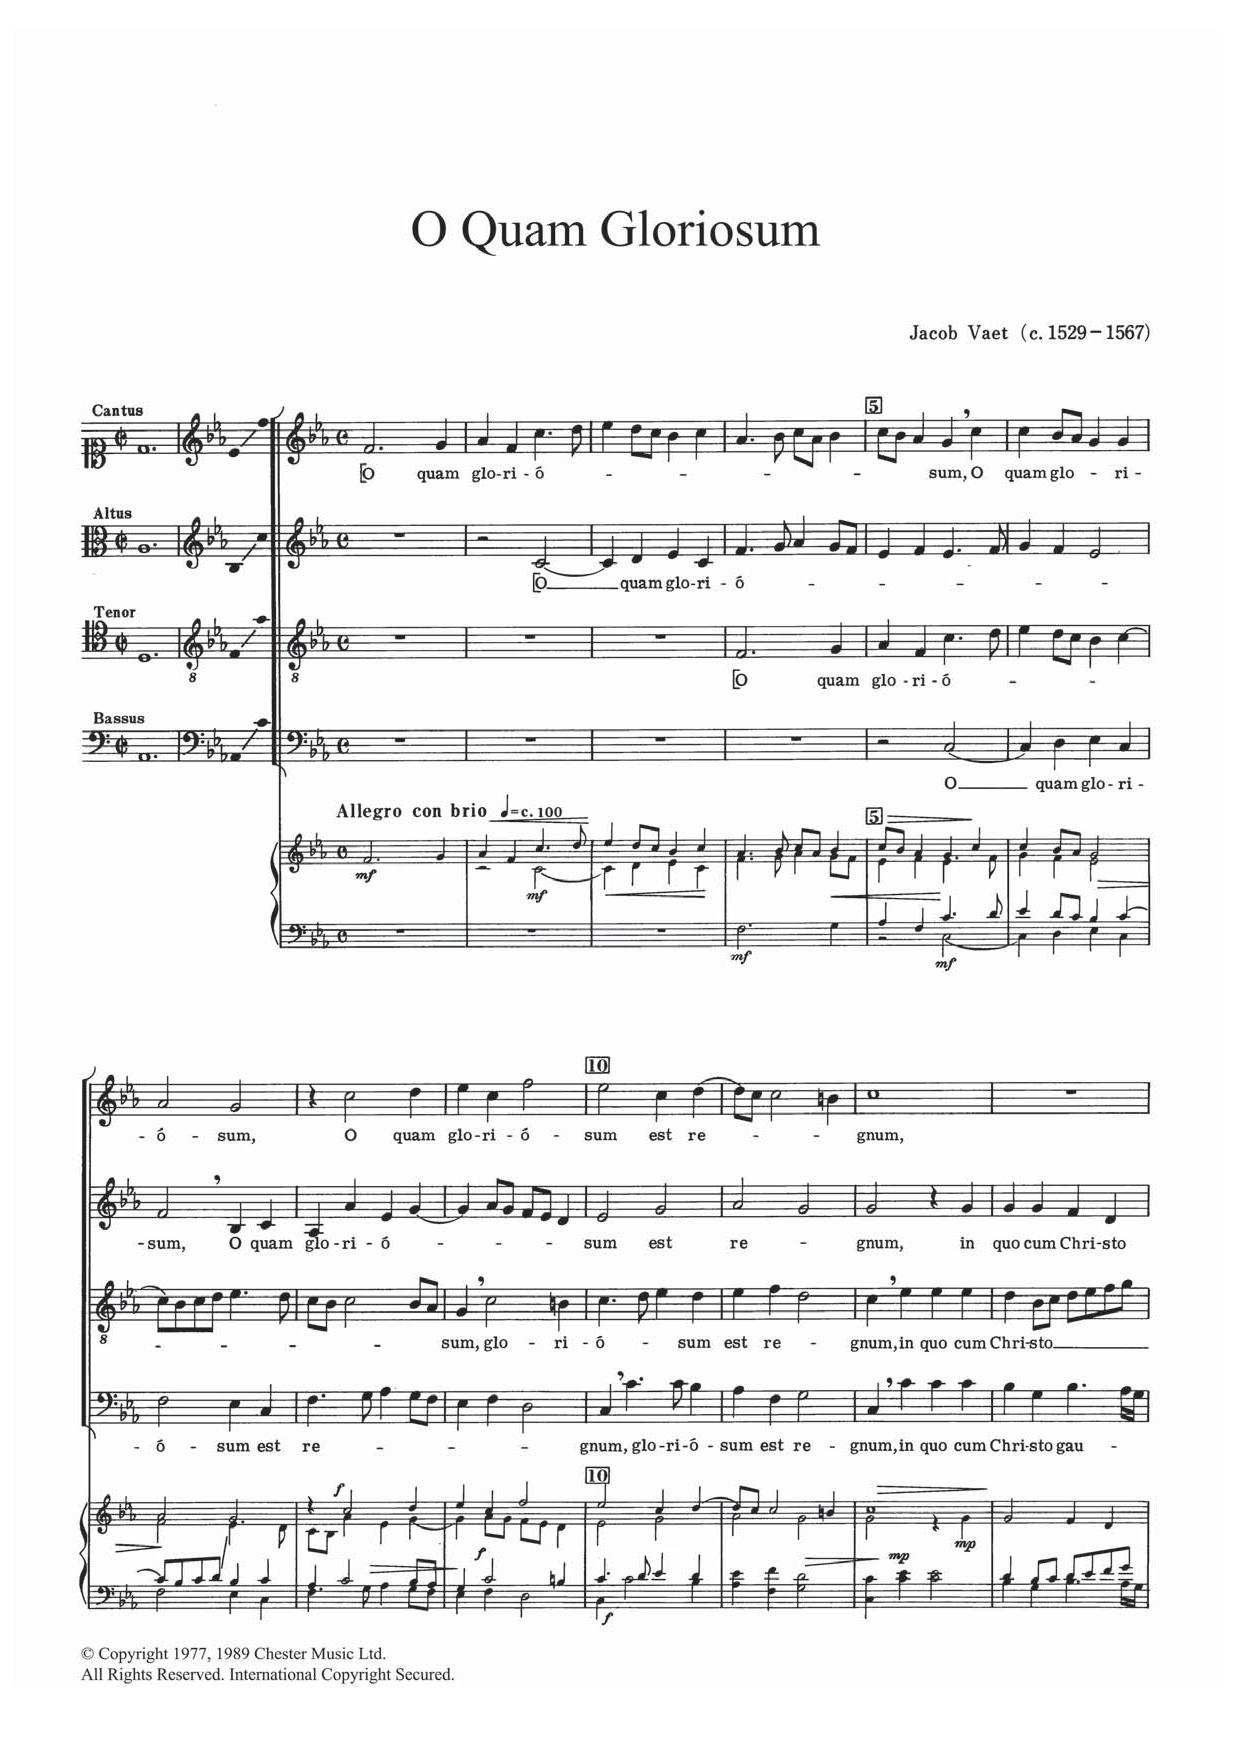 O Quam Gloriosum Sheet Music